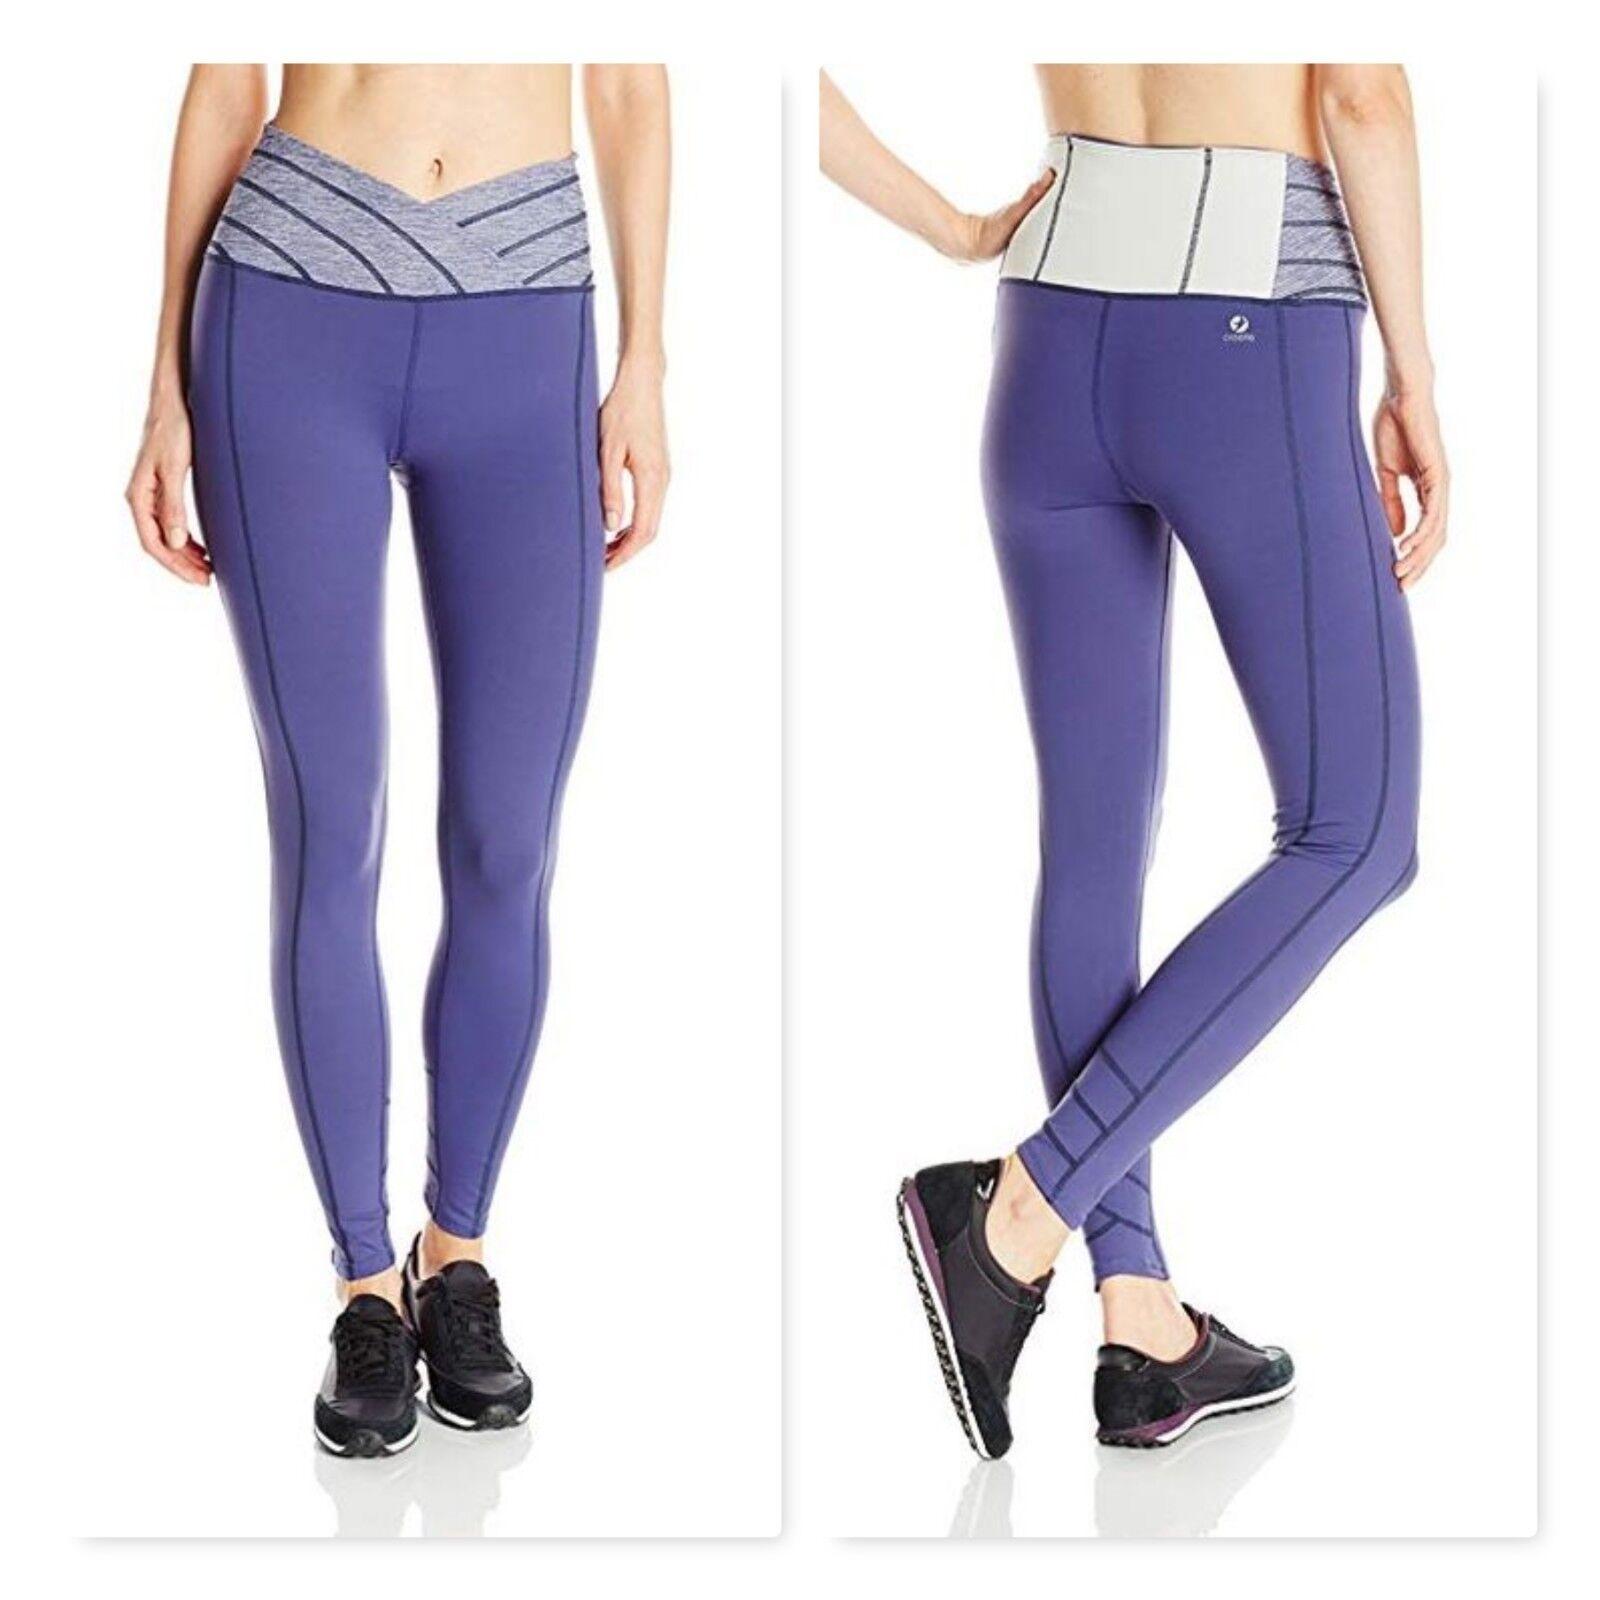 Oiselle Meter Tights workout pants satellite purple high waist sz 4